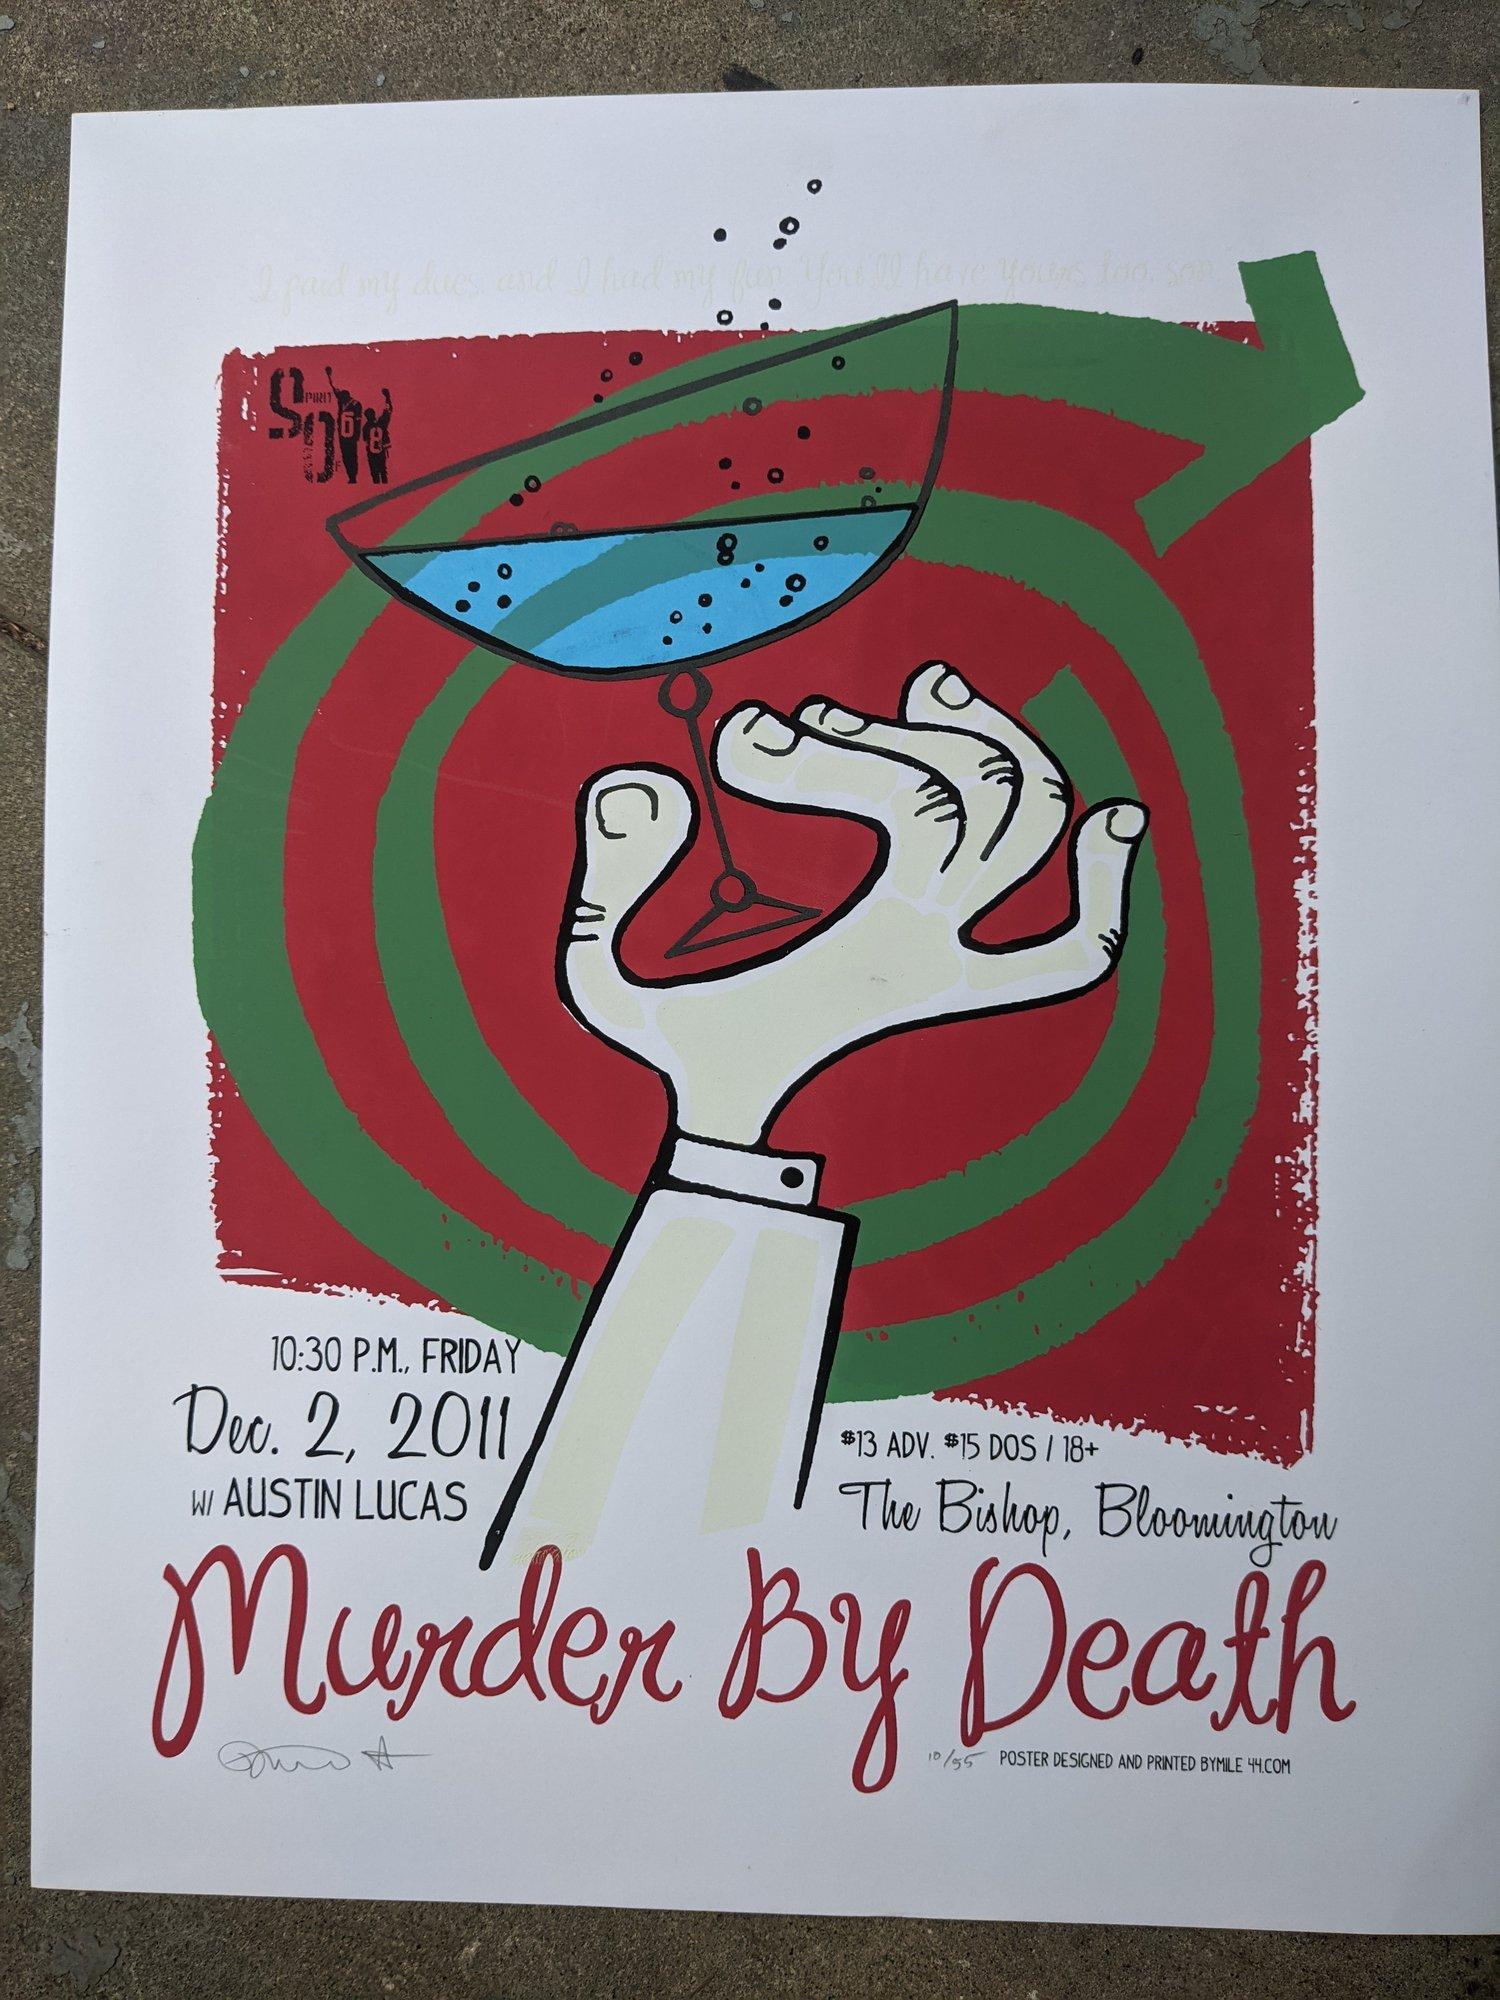 Image of 2011 glow in the dark Bloomington poster